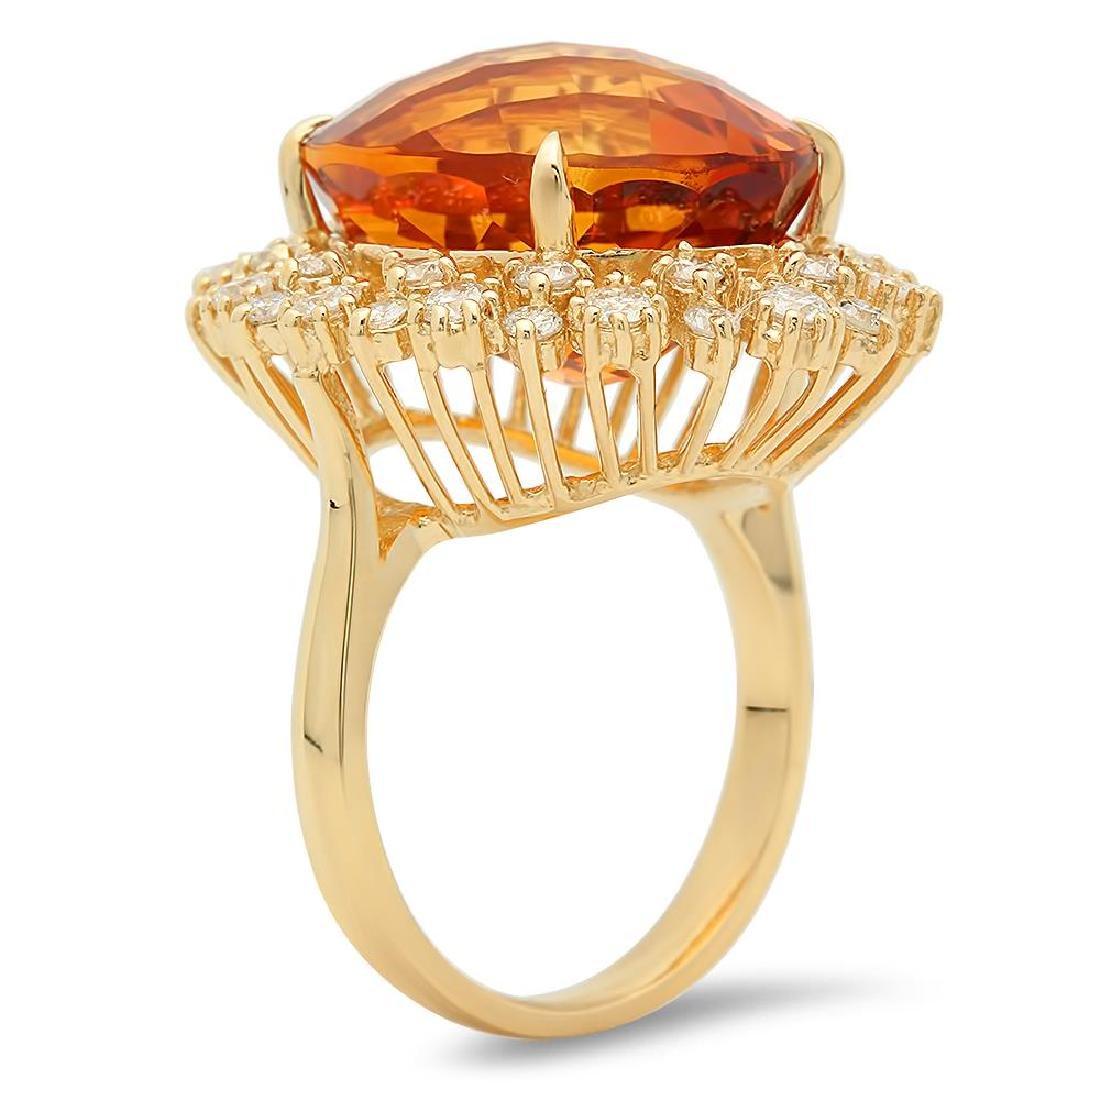 14K Gold 15.25ct Citrine 1.35cts Diamond Ring - 2